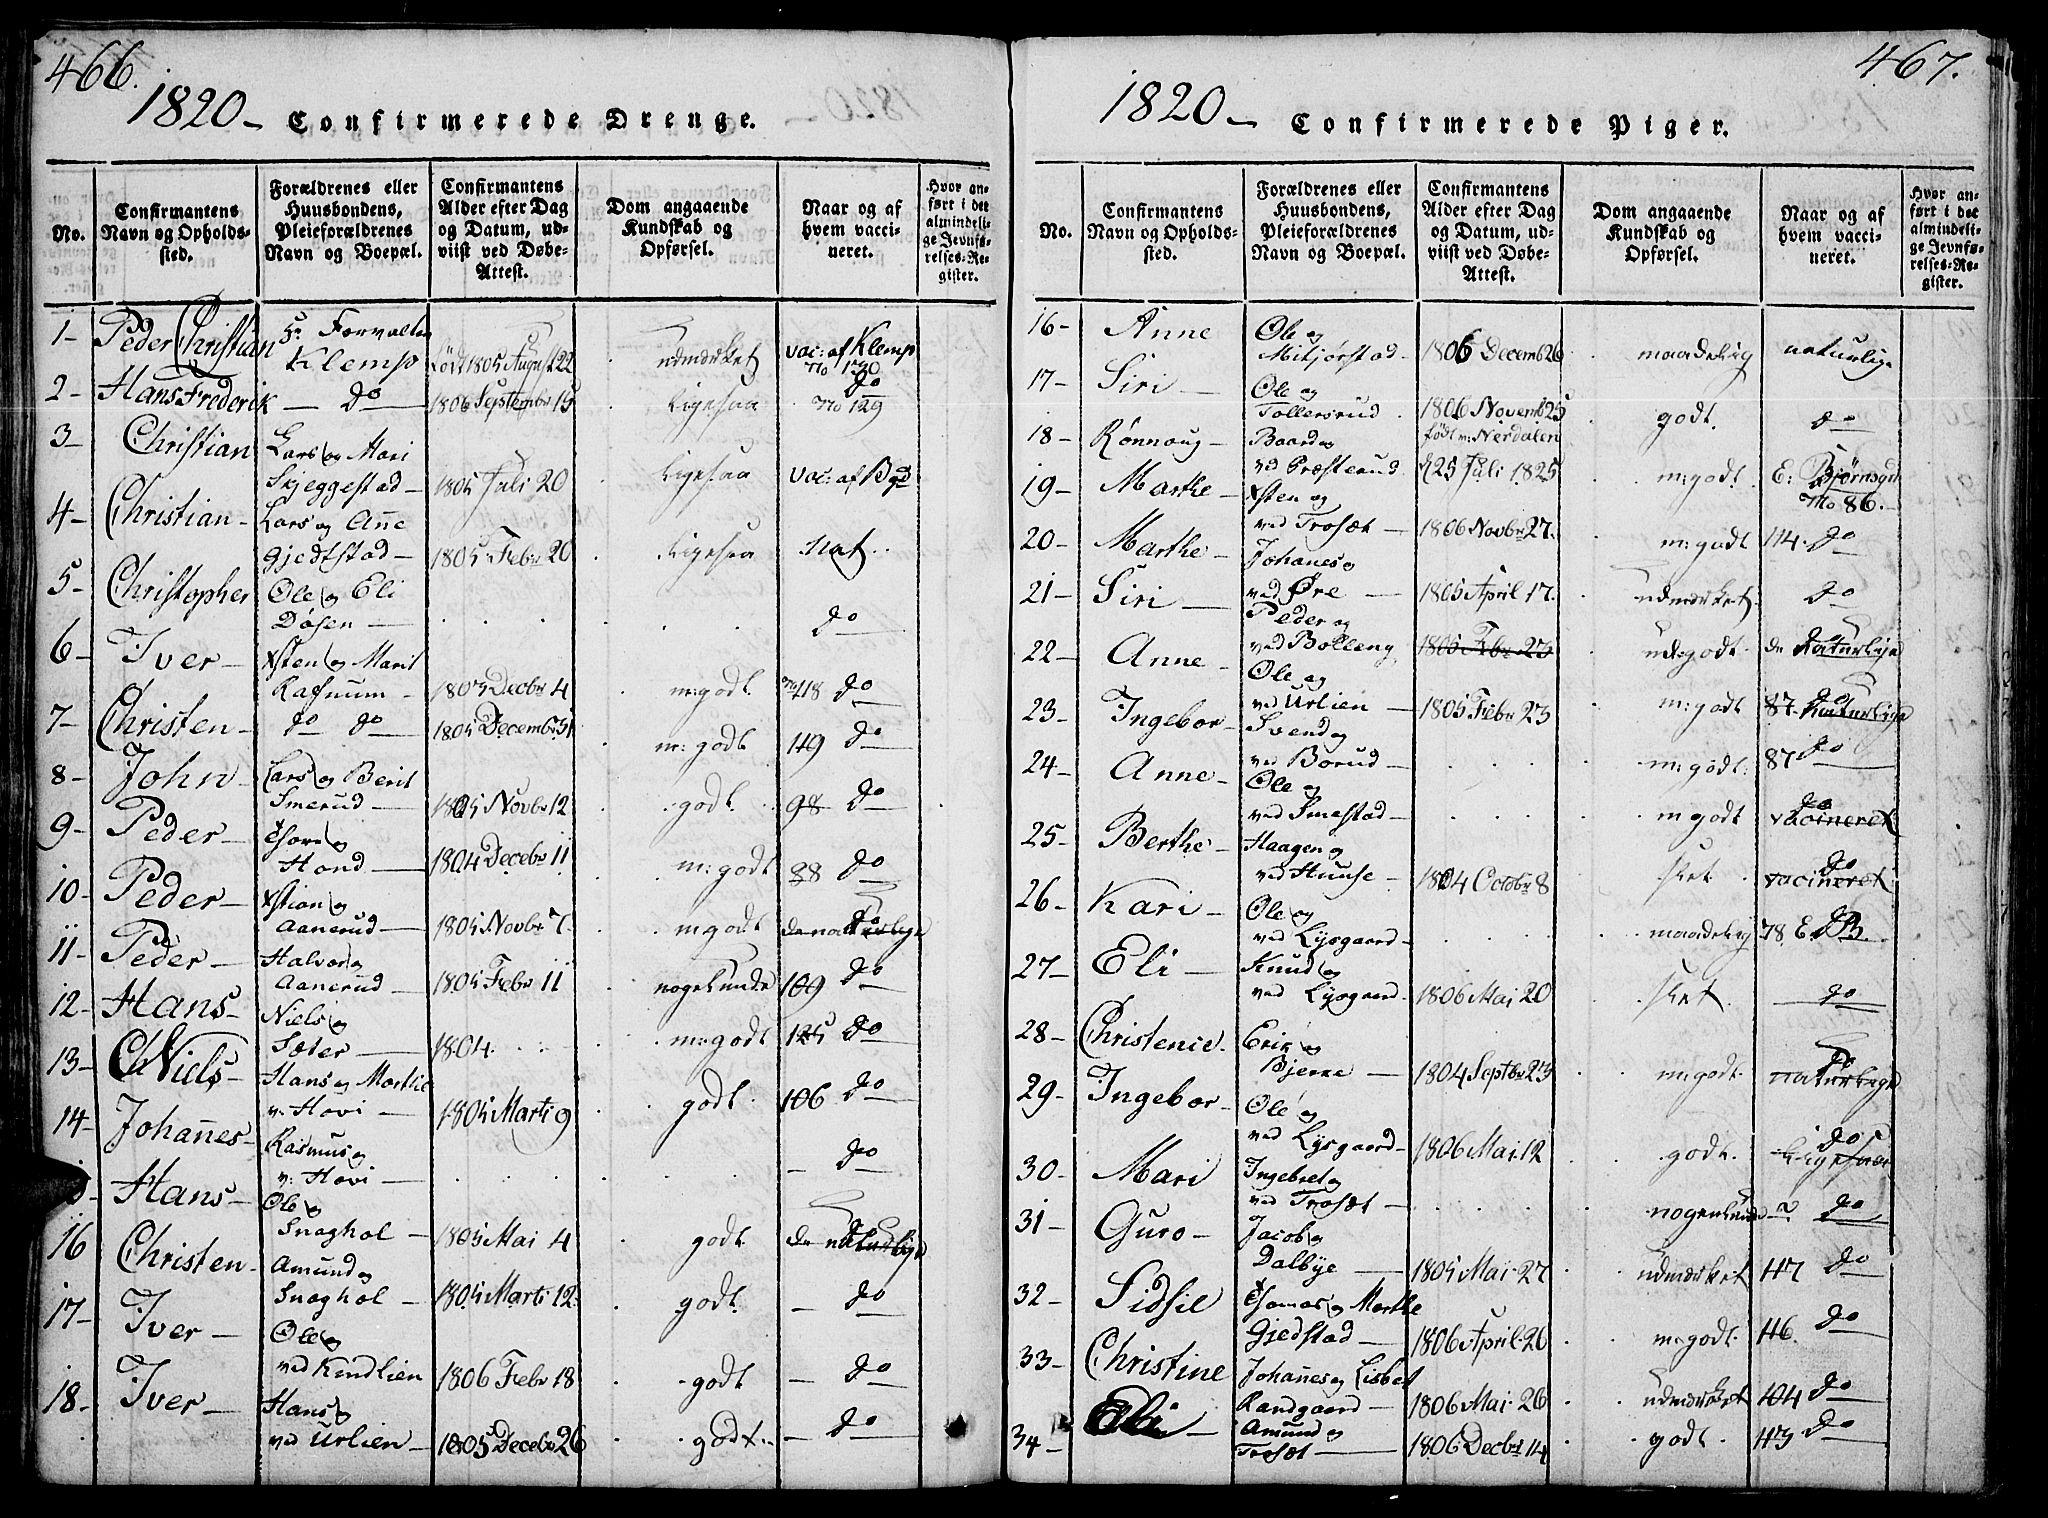 SAH, Fåberg prestekontor, Klokkerbok nr. 4, 1818-1837, s. 466-467